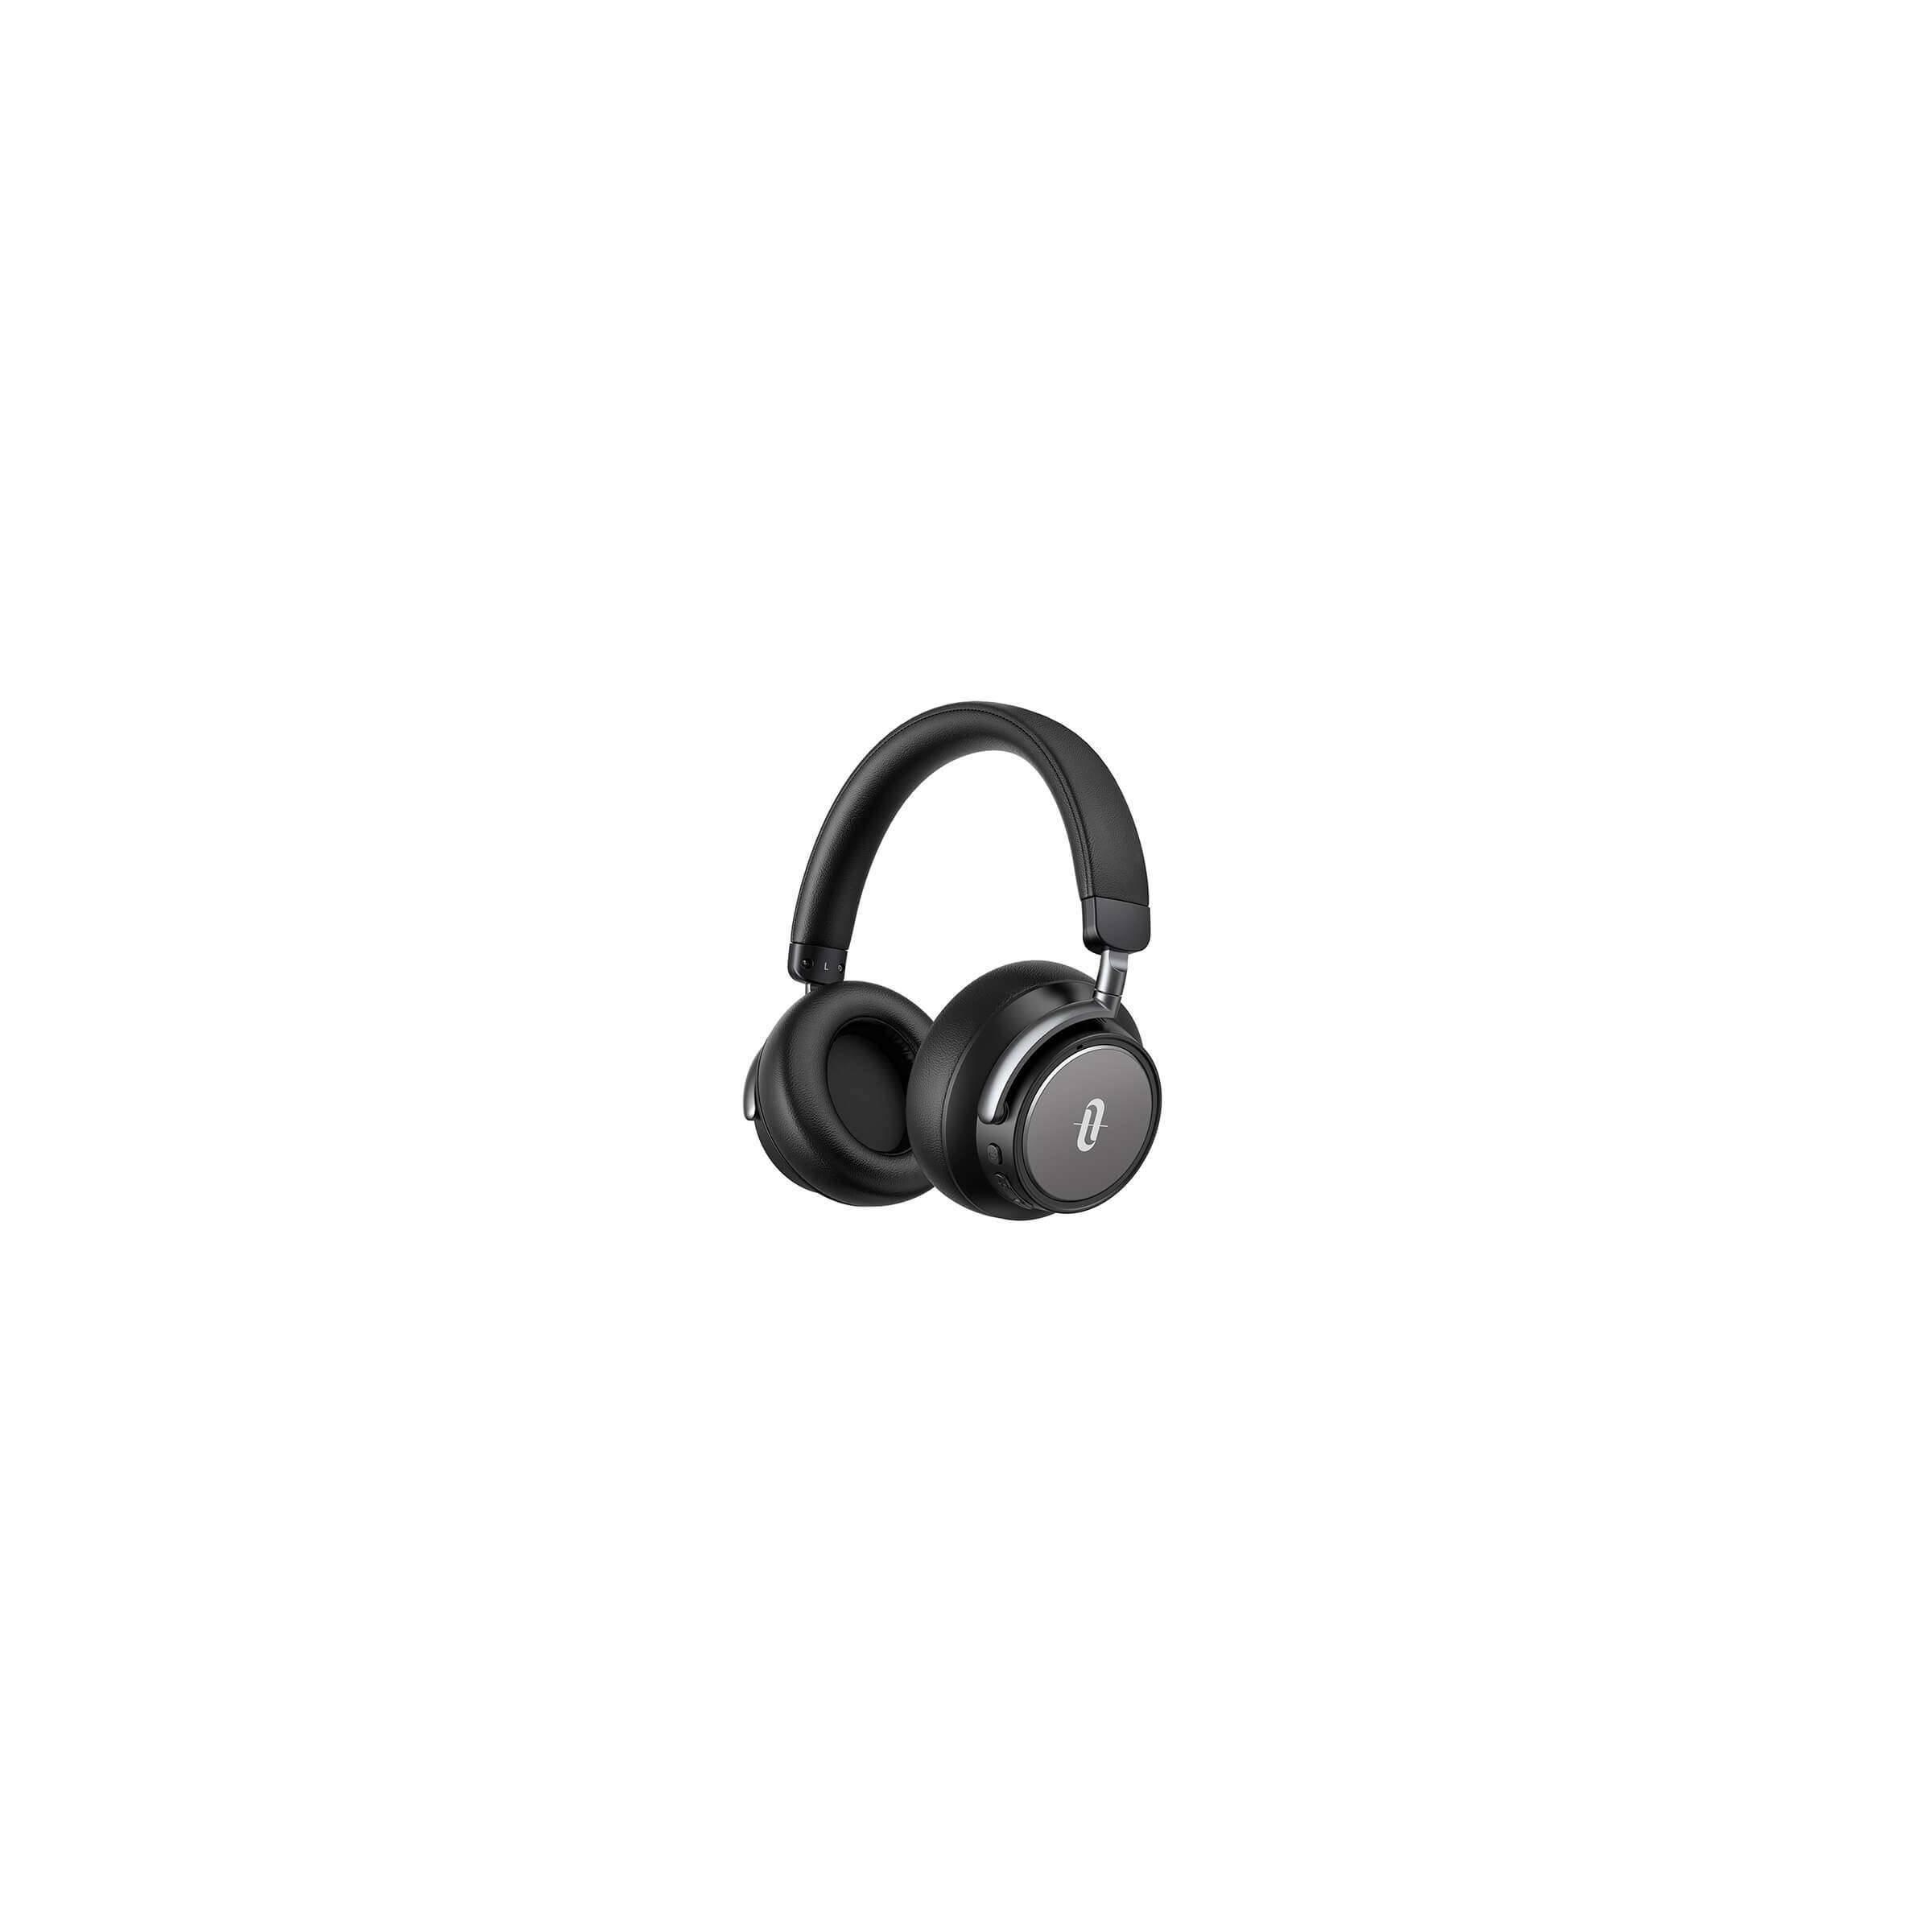 taotronics Taotronics soundsurge 46 anc trådløs noise cancelling headset fra mackabler.dk